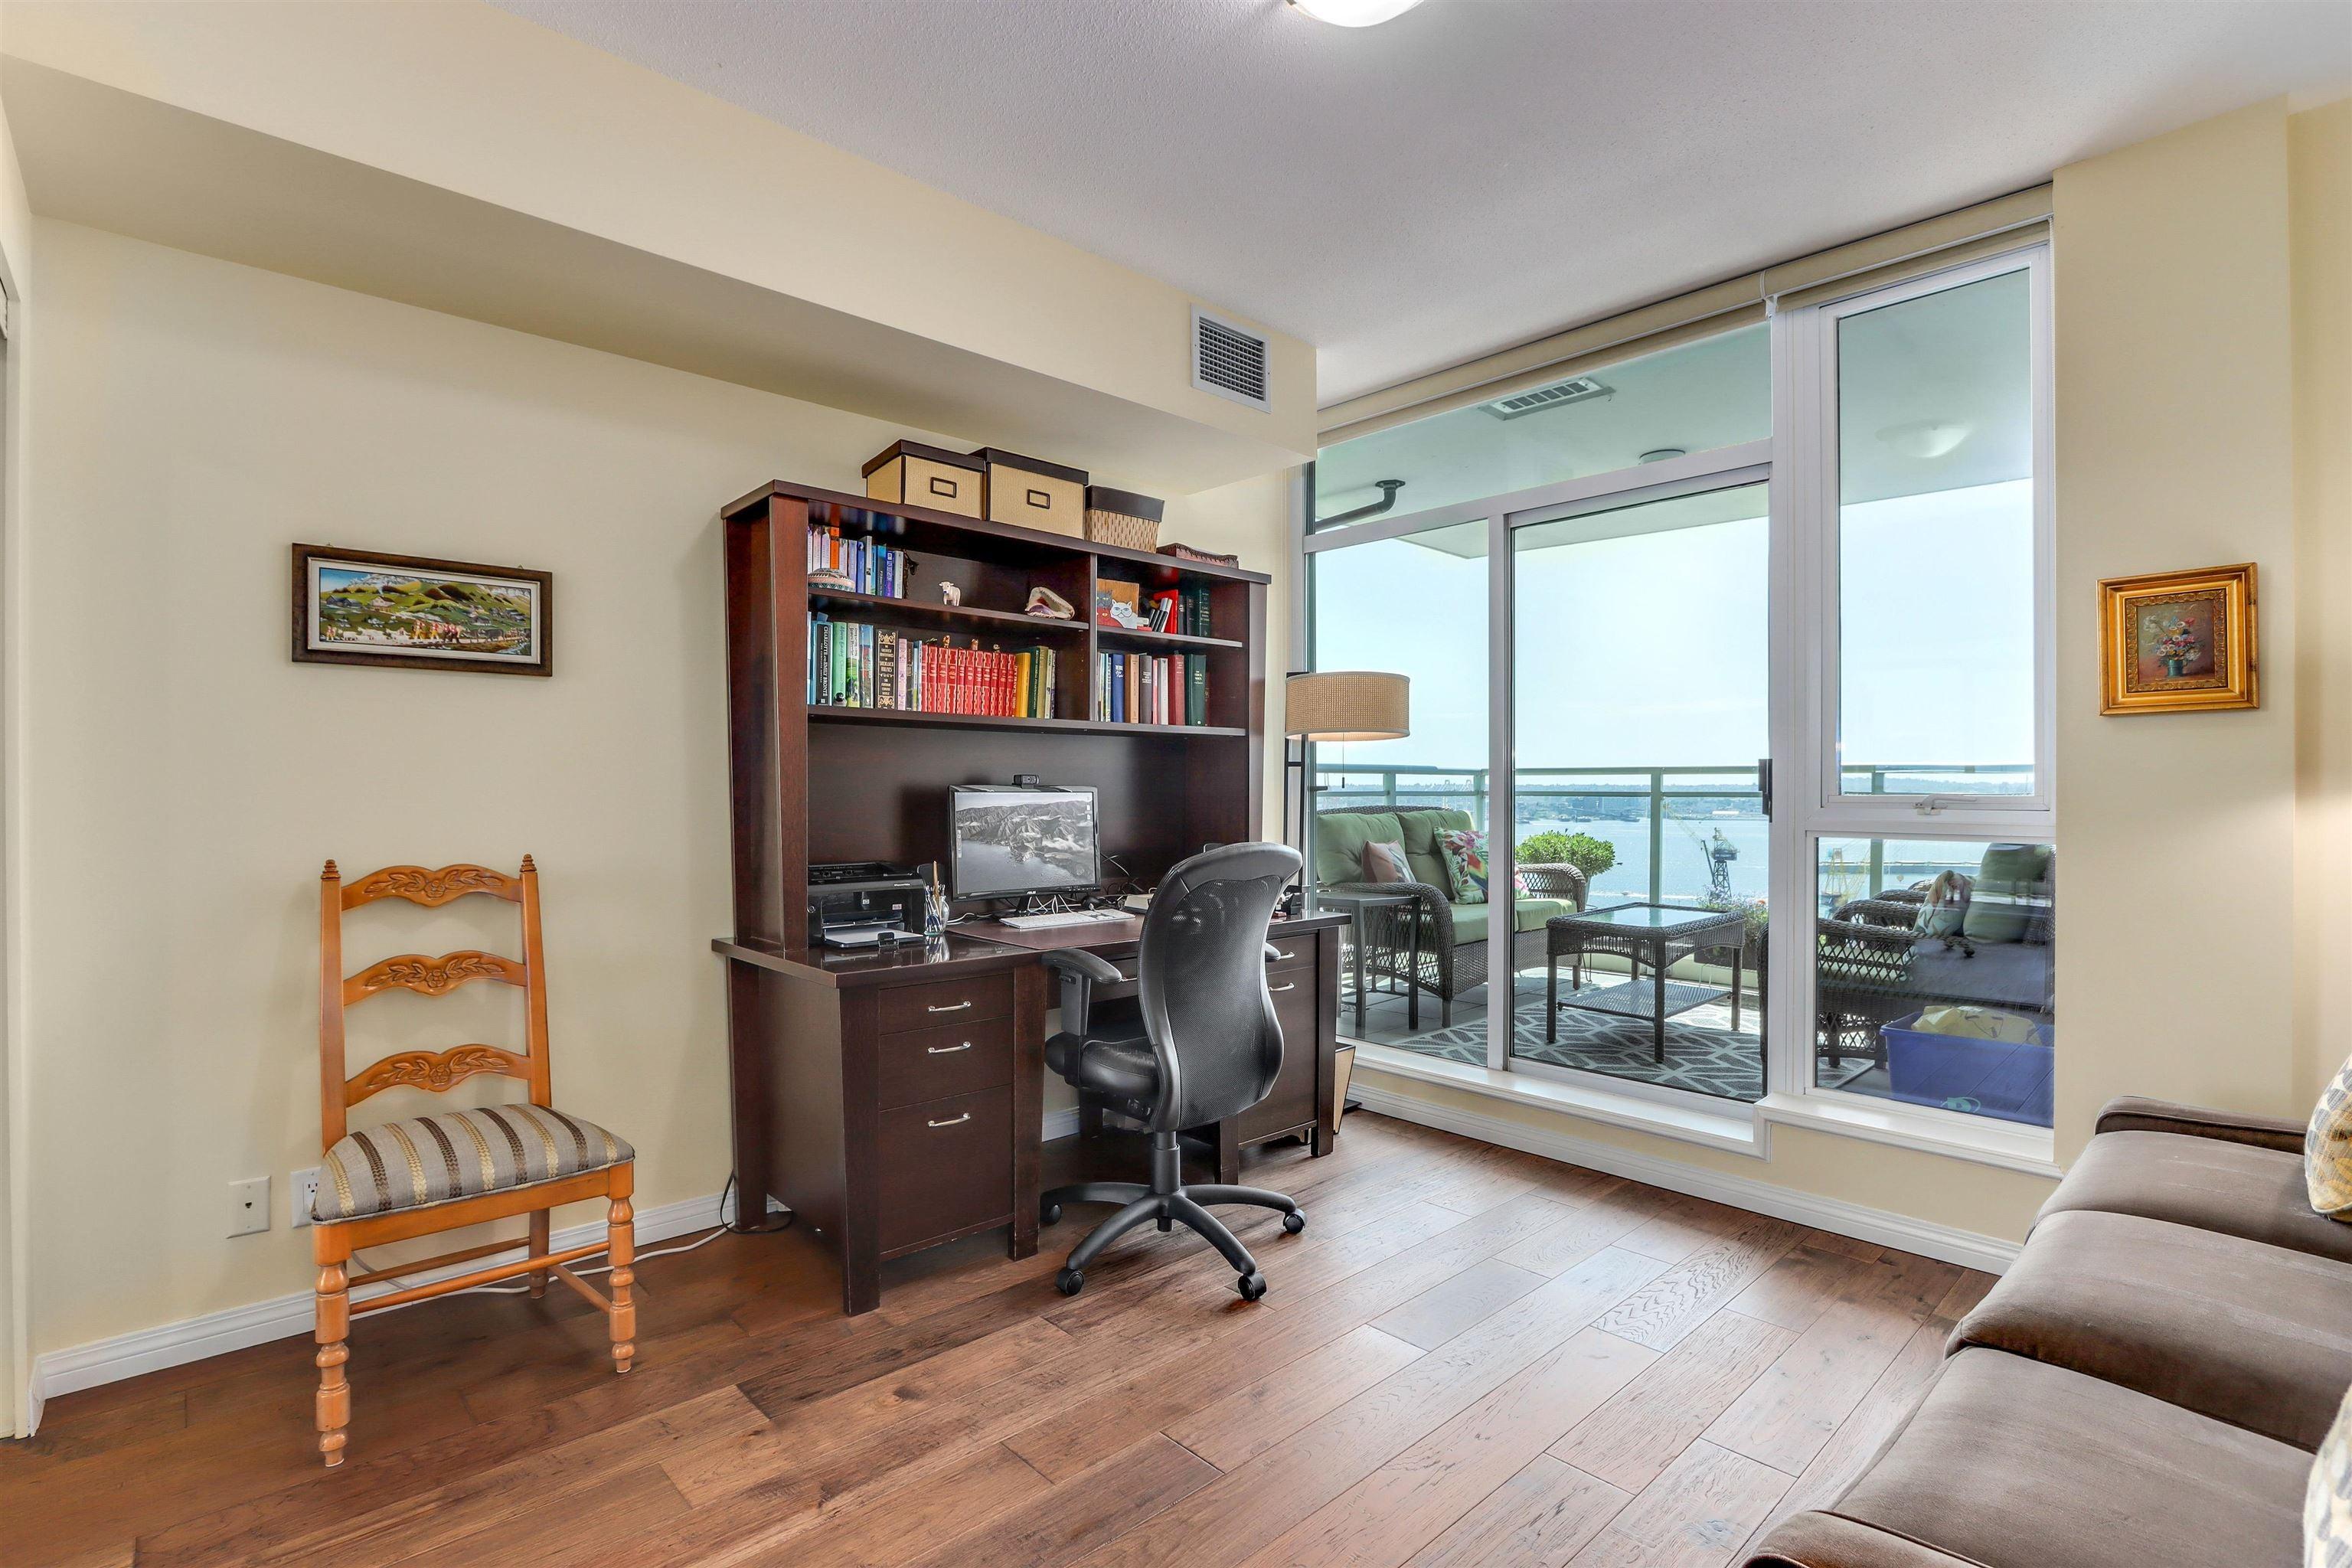 2202 188 E ESPLANADE - Lower Lonsdale Apartment/Condo for sale, 2 Bedrooms (R2618412) - #19